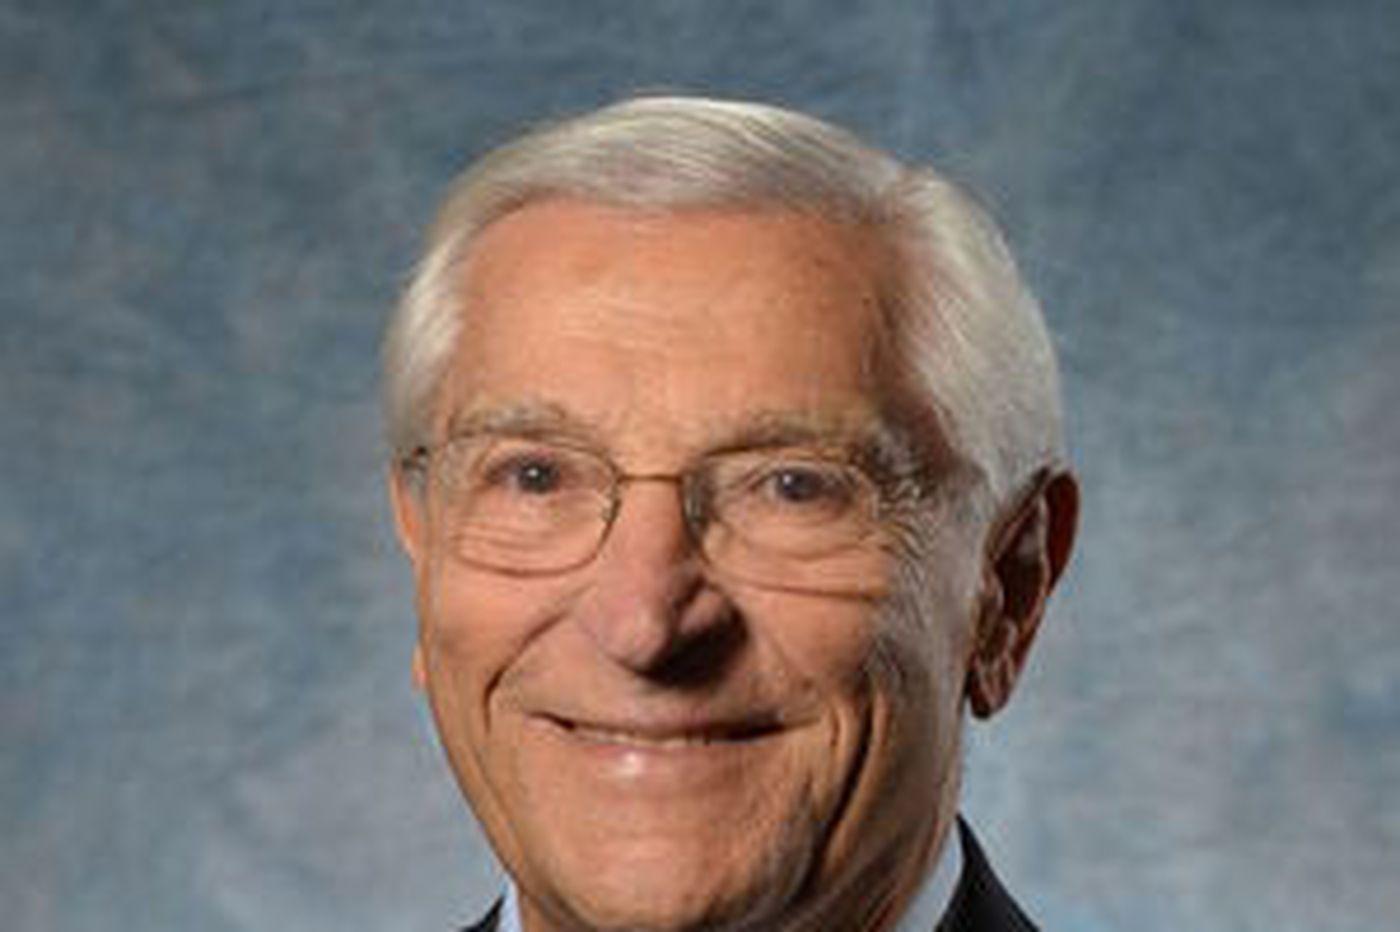 Kerry T. Pacifico, 95, businessman, World War II veteran, and philanthropist